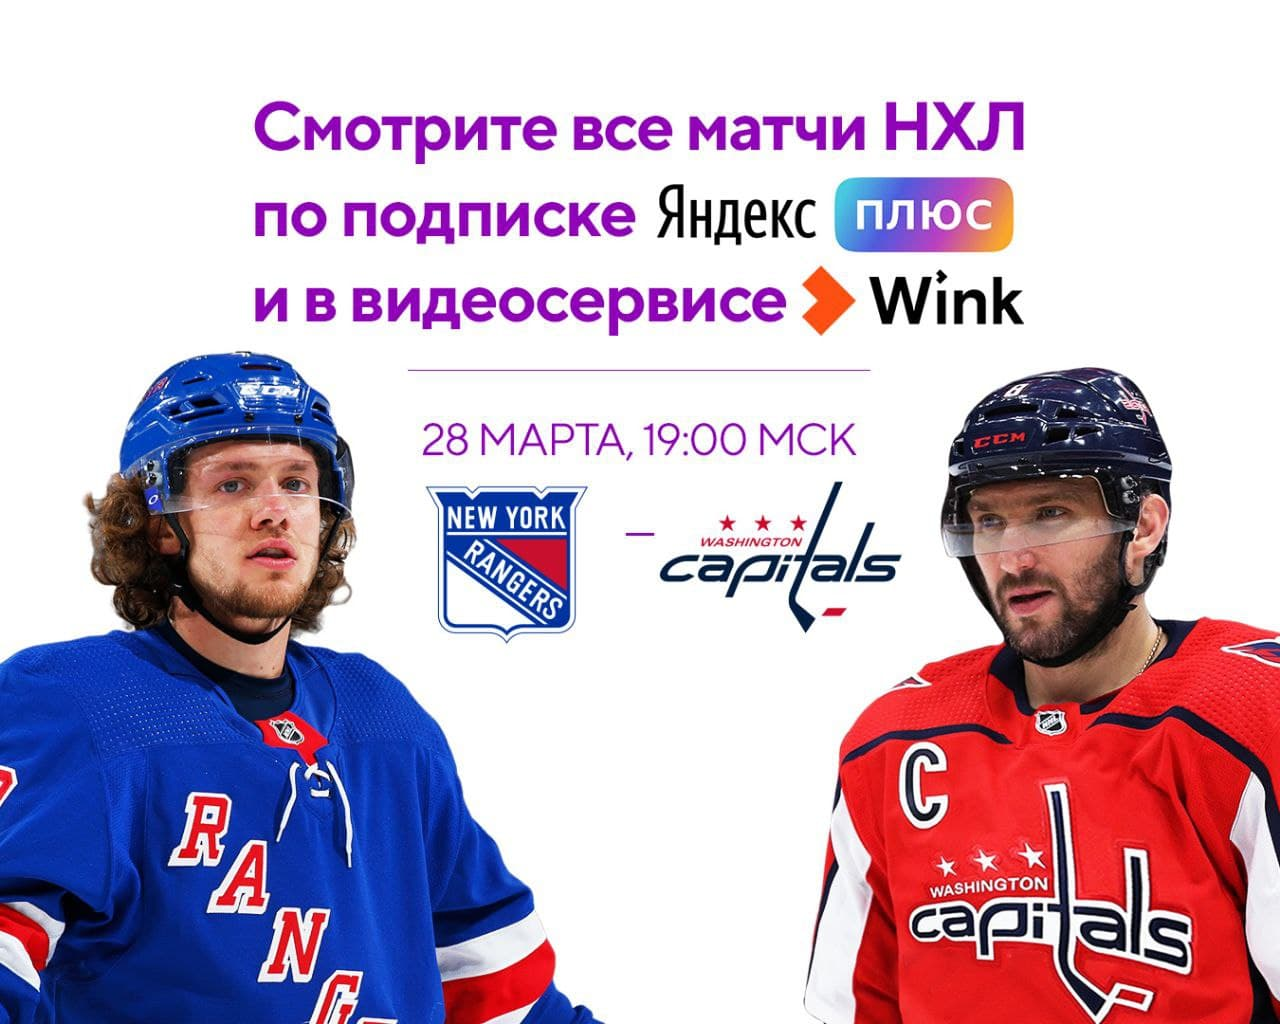 Смотрите новый раунд противостояния Овечкина и Панарина. С Яндекс Плюсом или в видеосервисе Wink